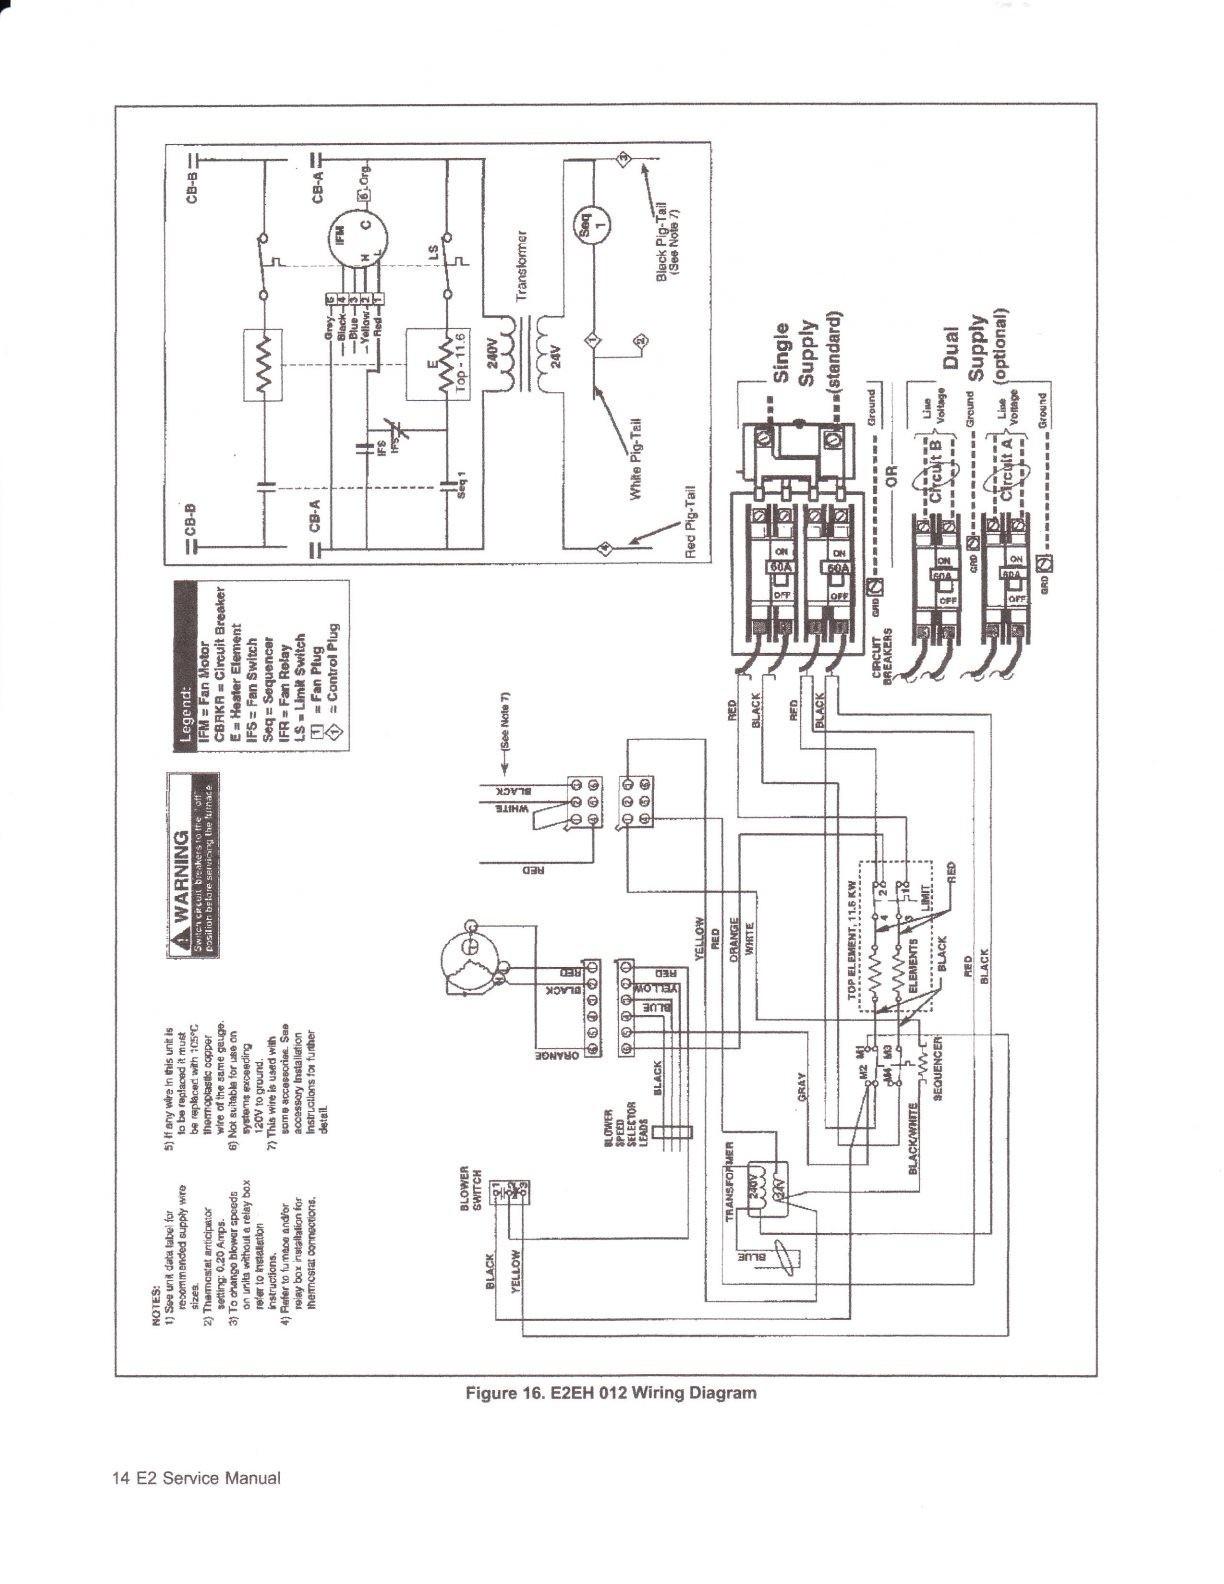 Beckett Wiring Diagram | Best Part of Wiring Diagram on oil furnace wiring diagram, beckett burner wire diagram, beckett oil burner wiring-diagram, beckett r7184a 1075 manual,